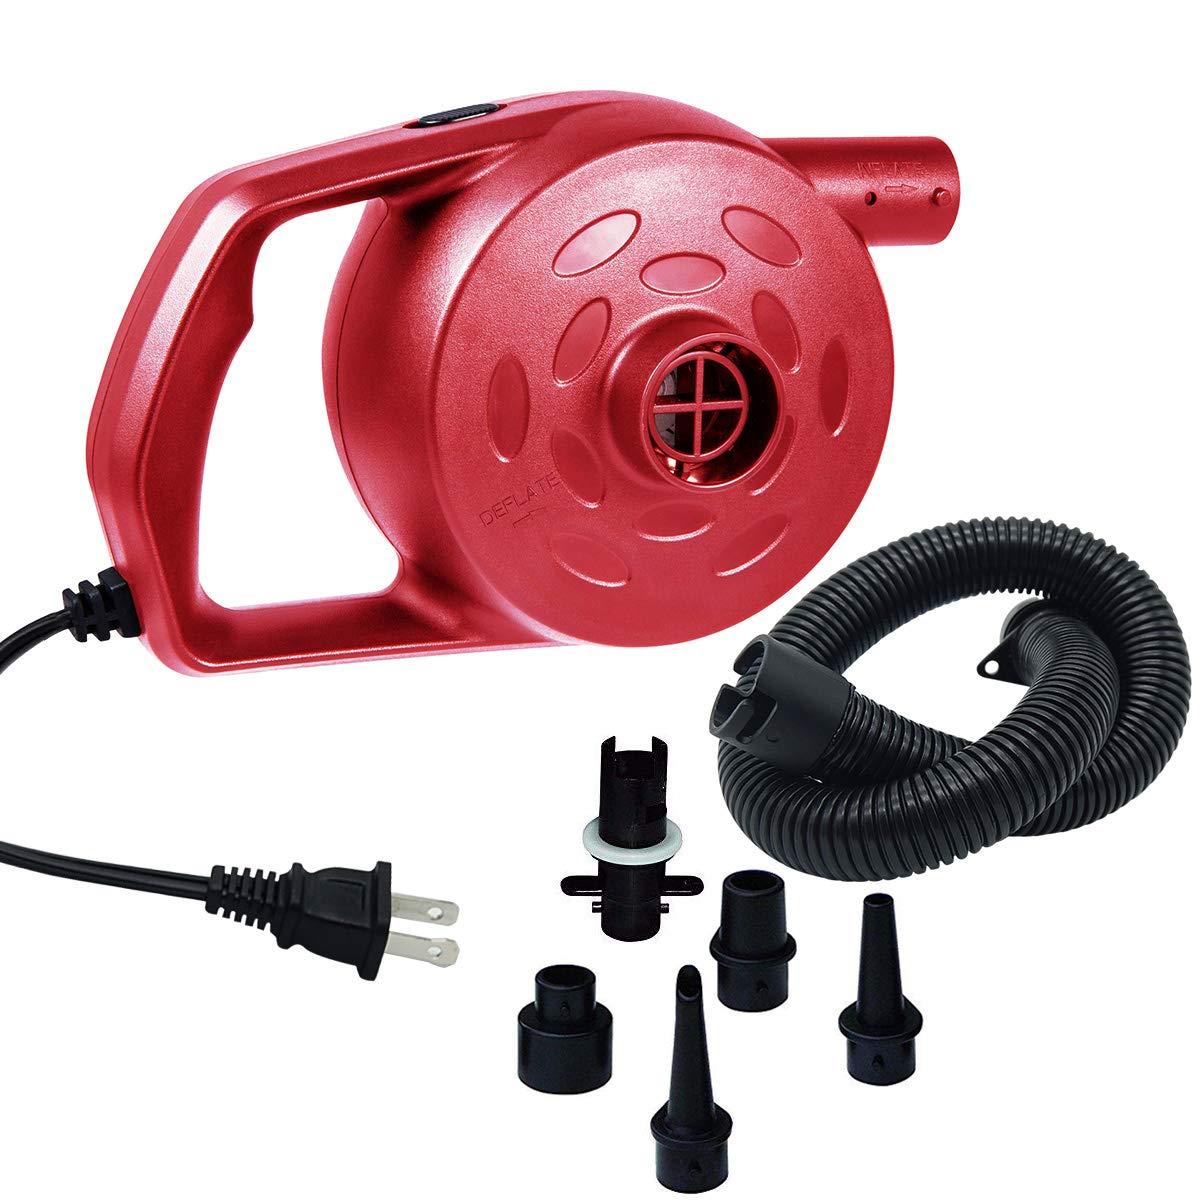 chamvis Electric Air Pump High Power Quick-Fill Air Mattress Pump